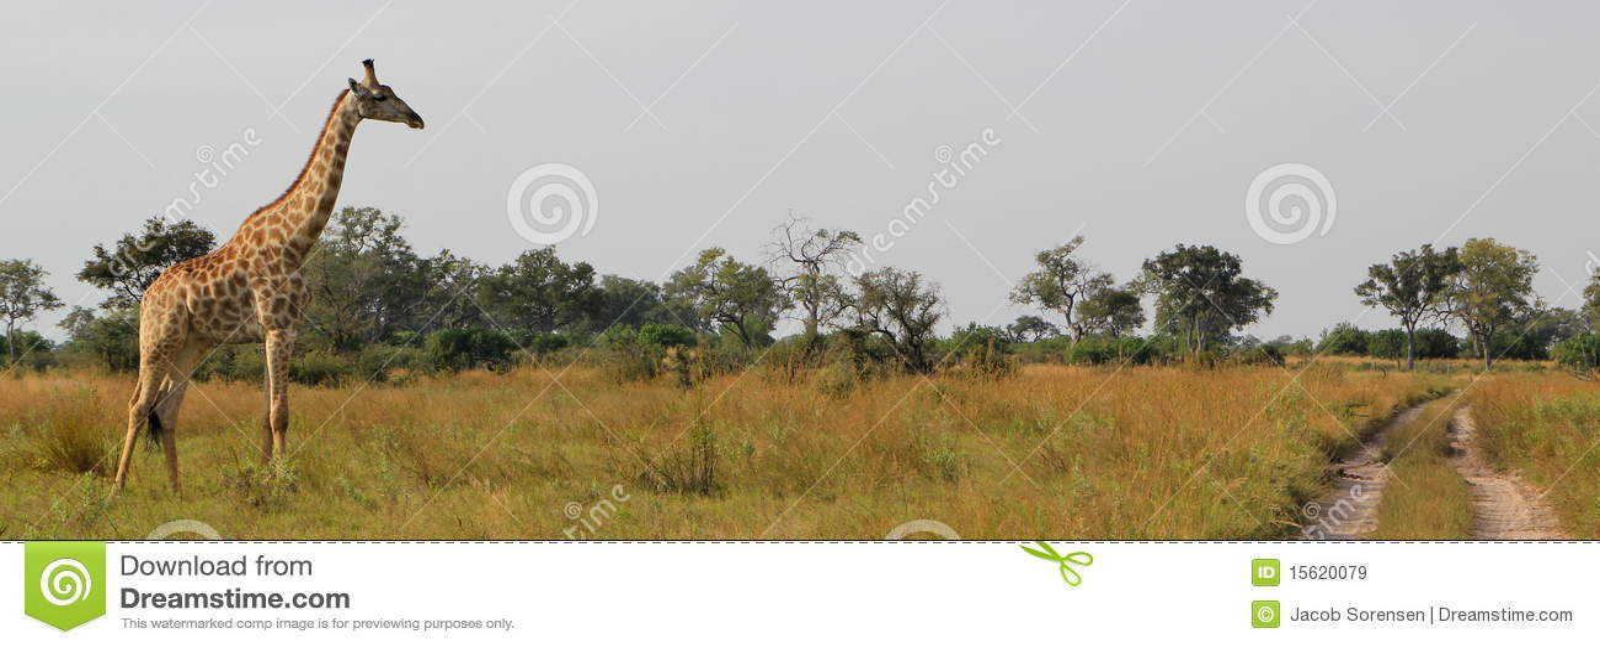 Giraffe africaine